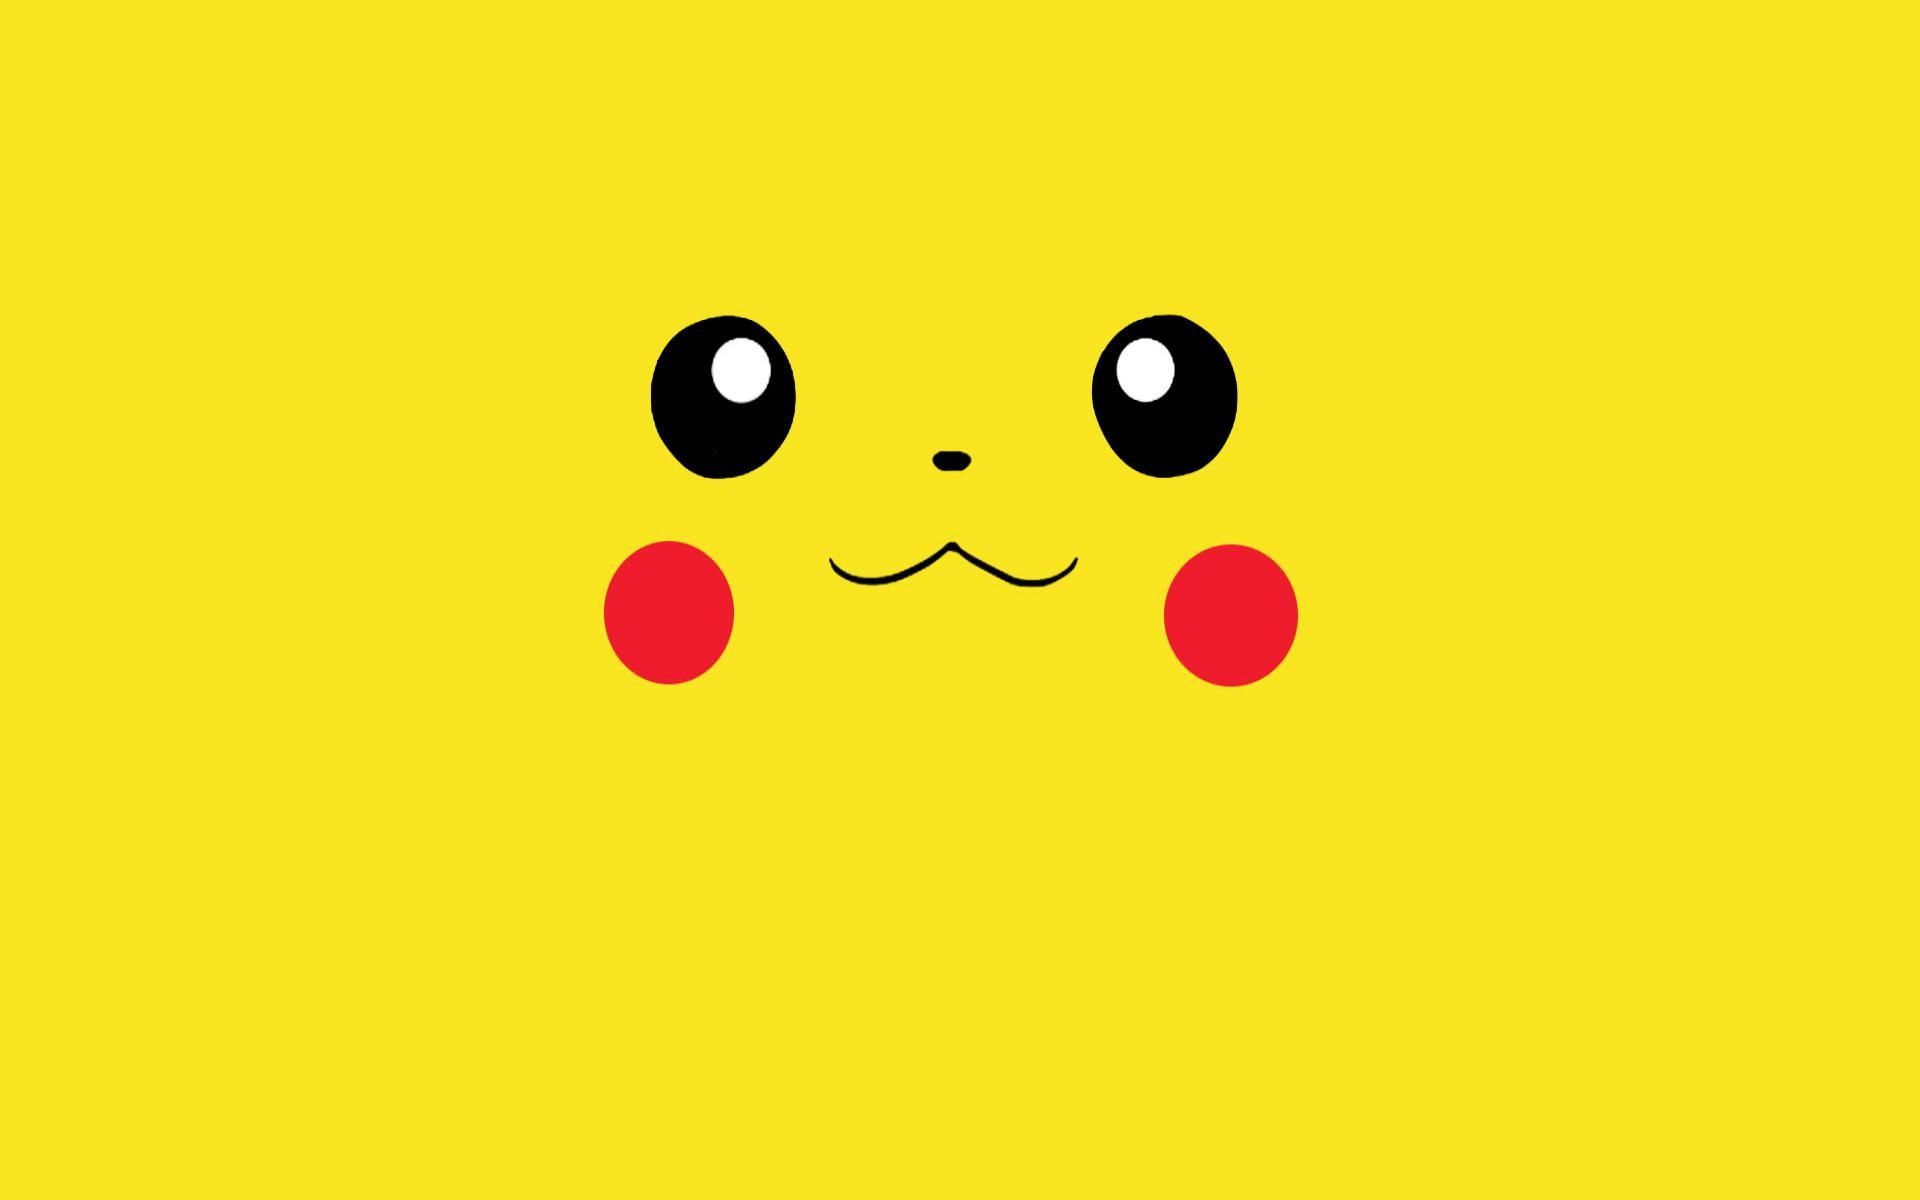 Wallpaper illustration pok mon smiley pikachu icon emoticon illustration pok mon smiley pikachu icon emoticon font altavistaventures Images